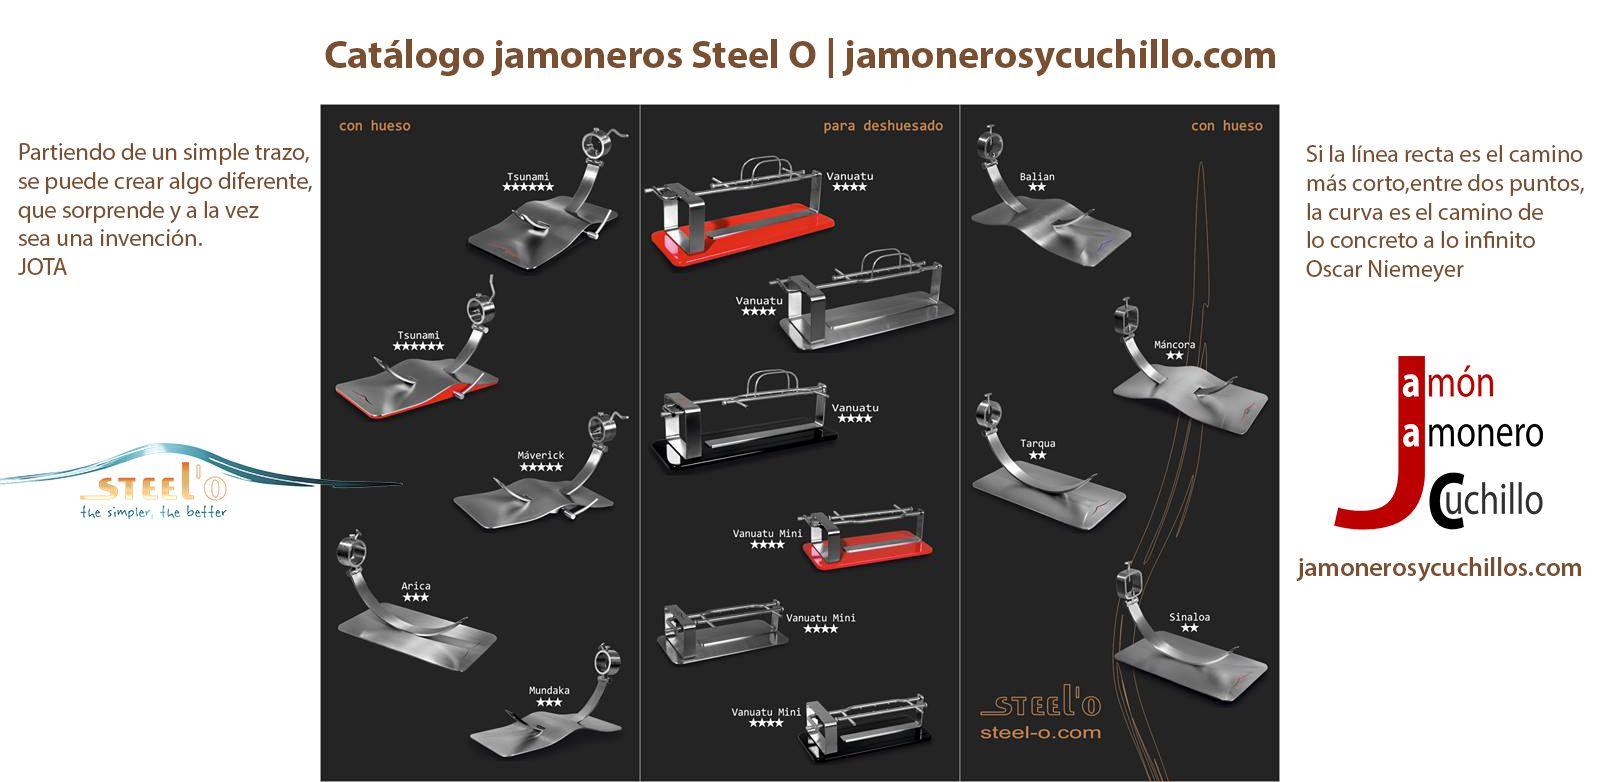 catalogo jamoneros steel o jamon jamoneros y cuchillos